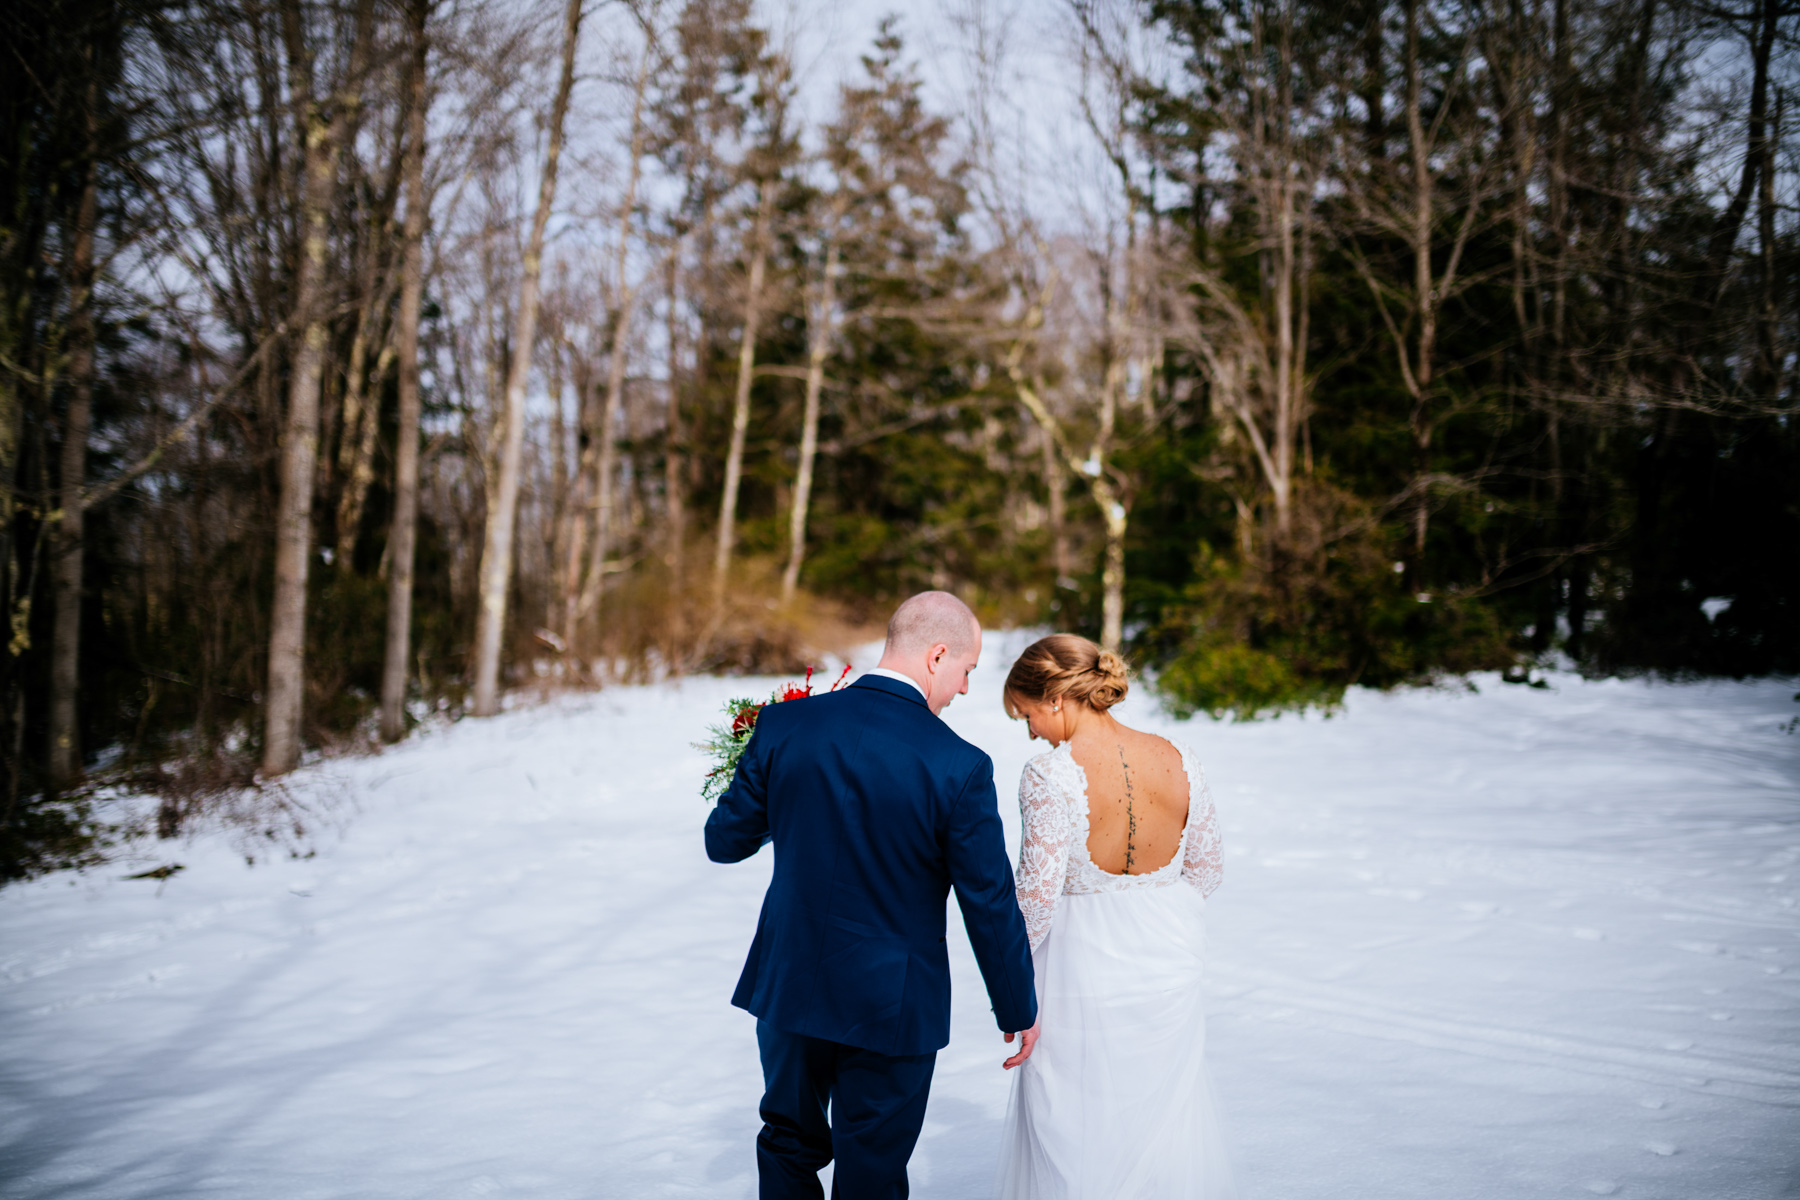 bride and groom walking through snow